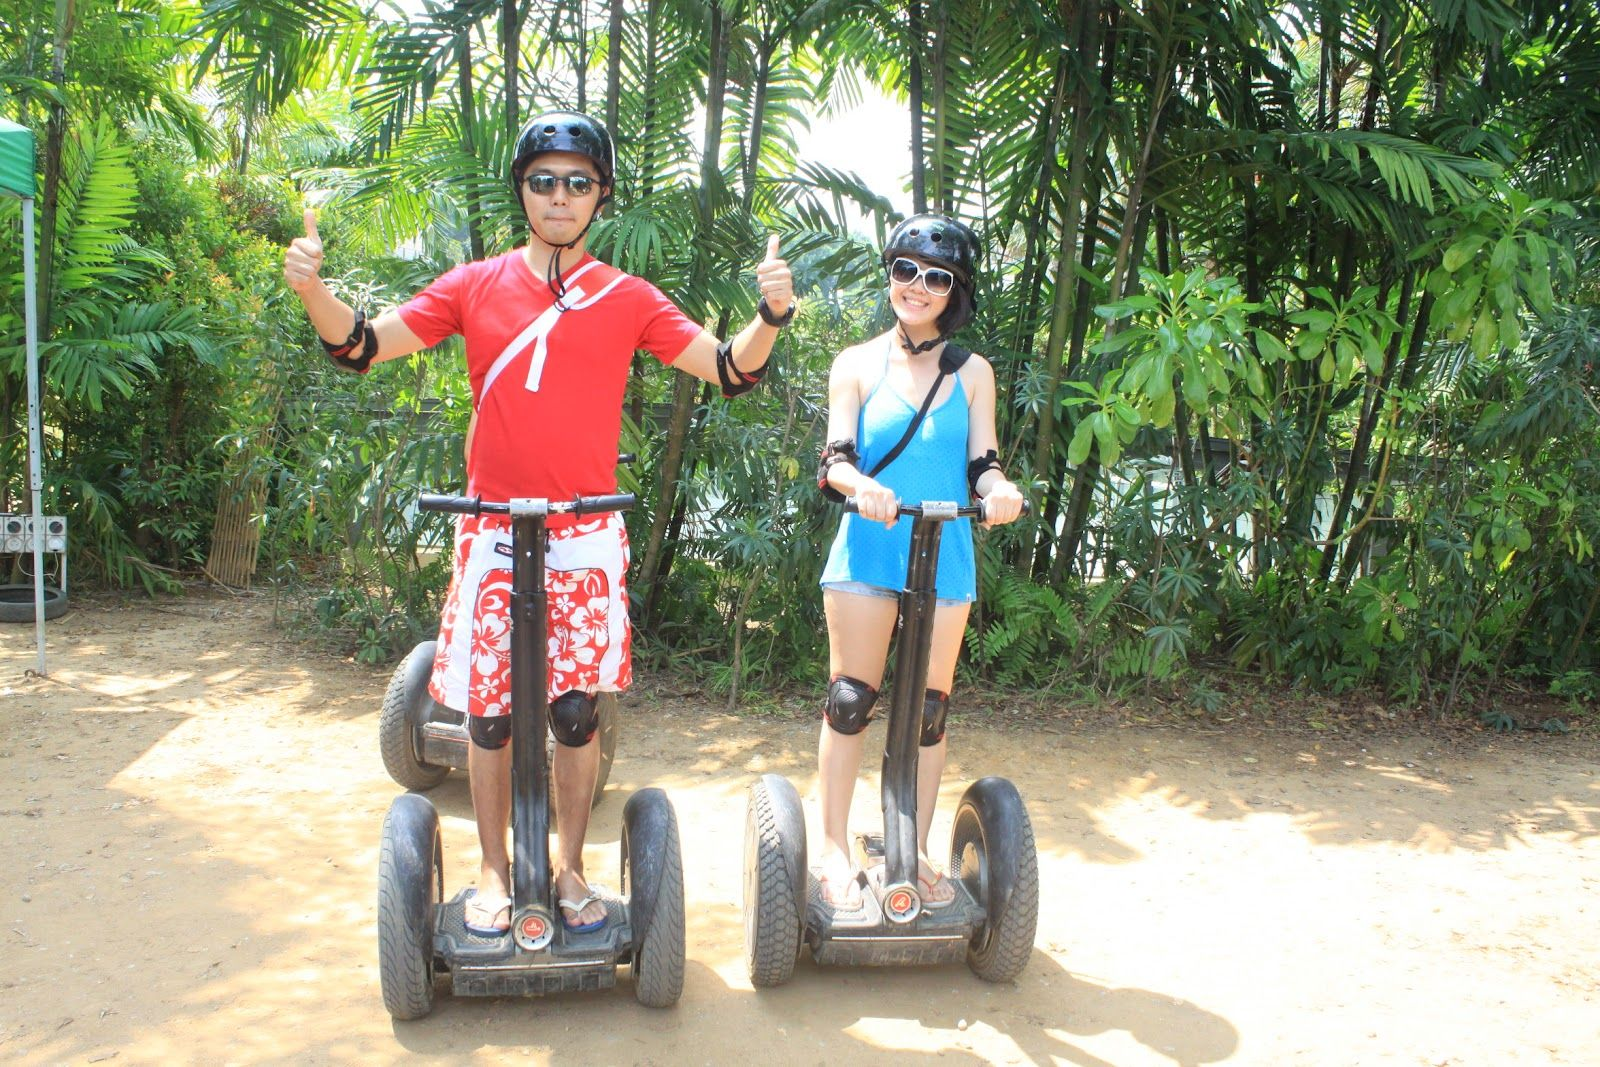 Tourist Attractions in Gogreen Segway Eco Adventure in